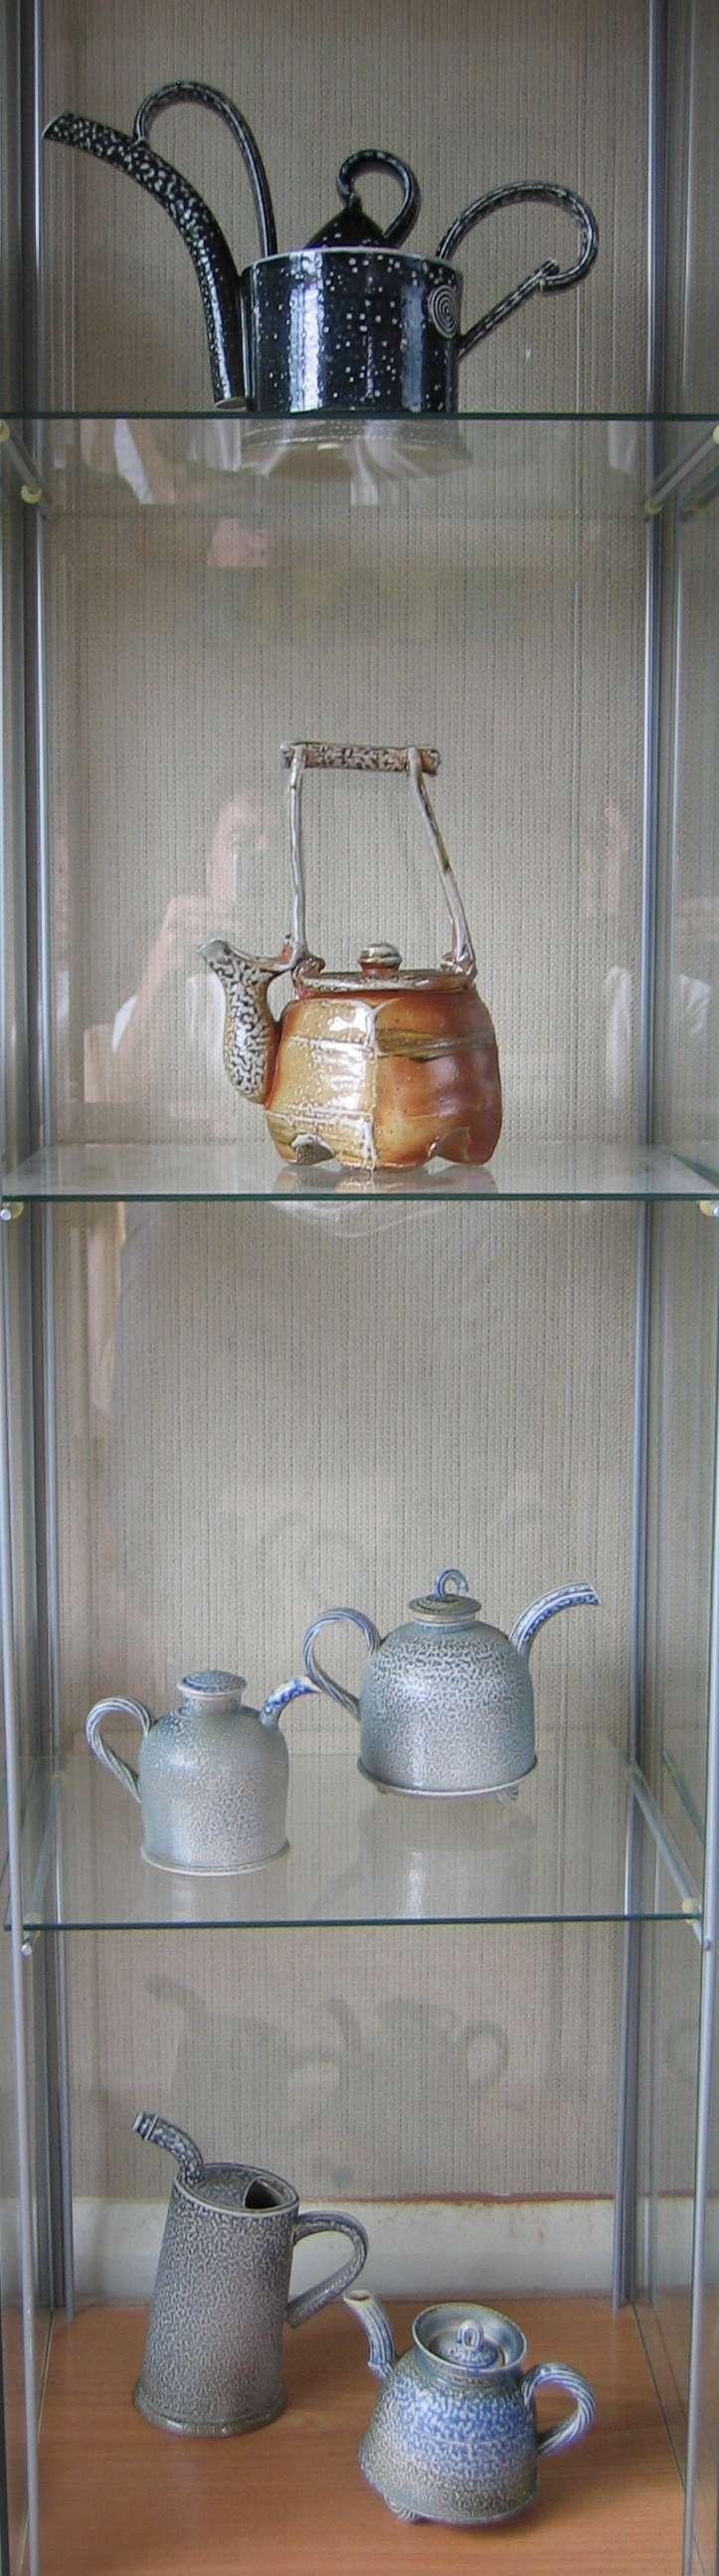 Teapot  Gallery - Page 2 Teapot10